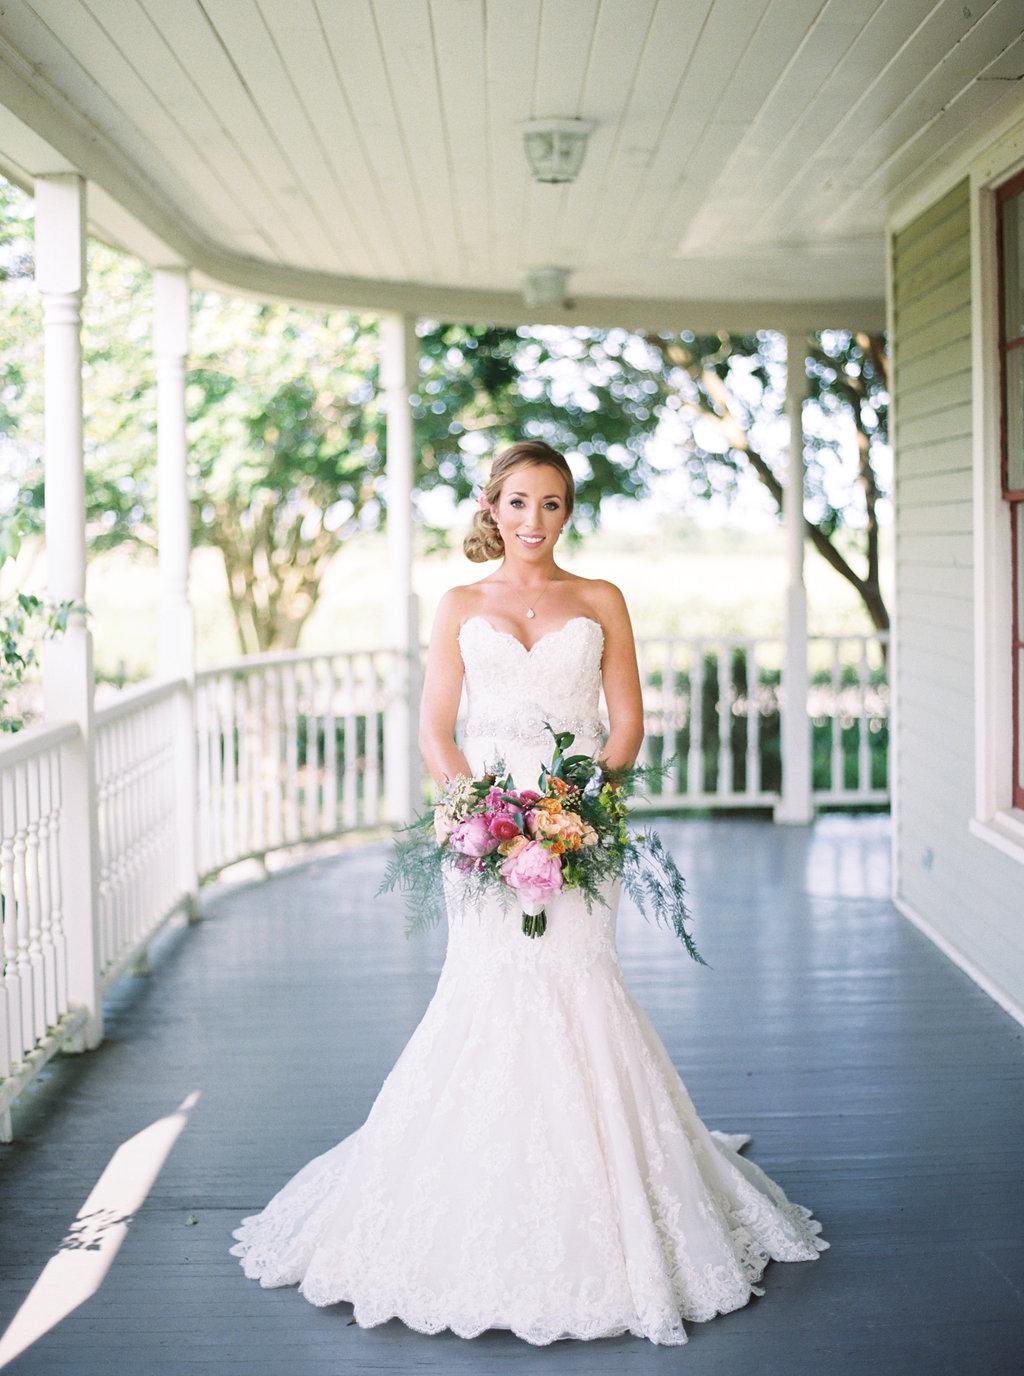 aprylann_wedding_297.jpg